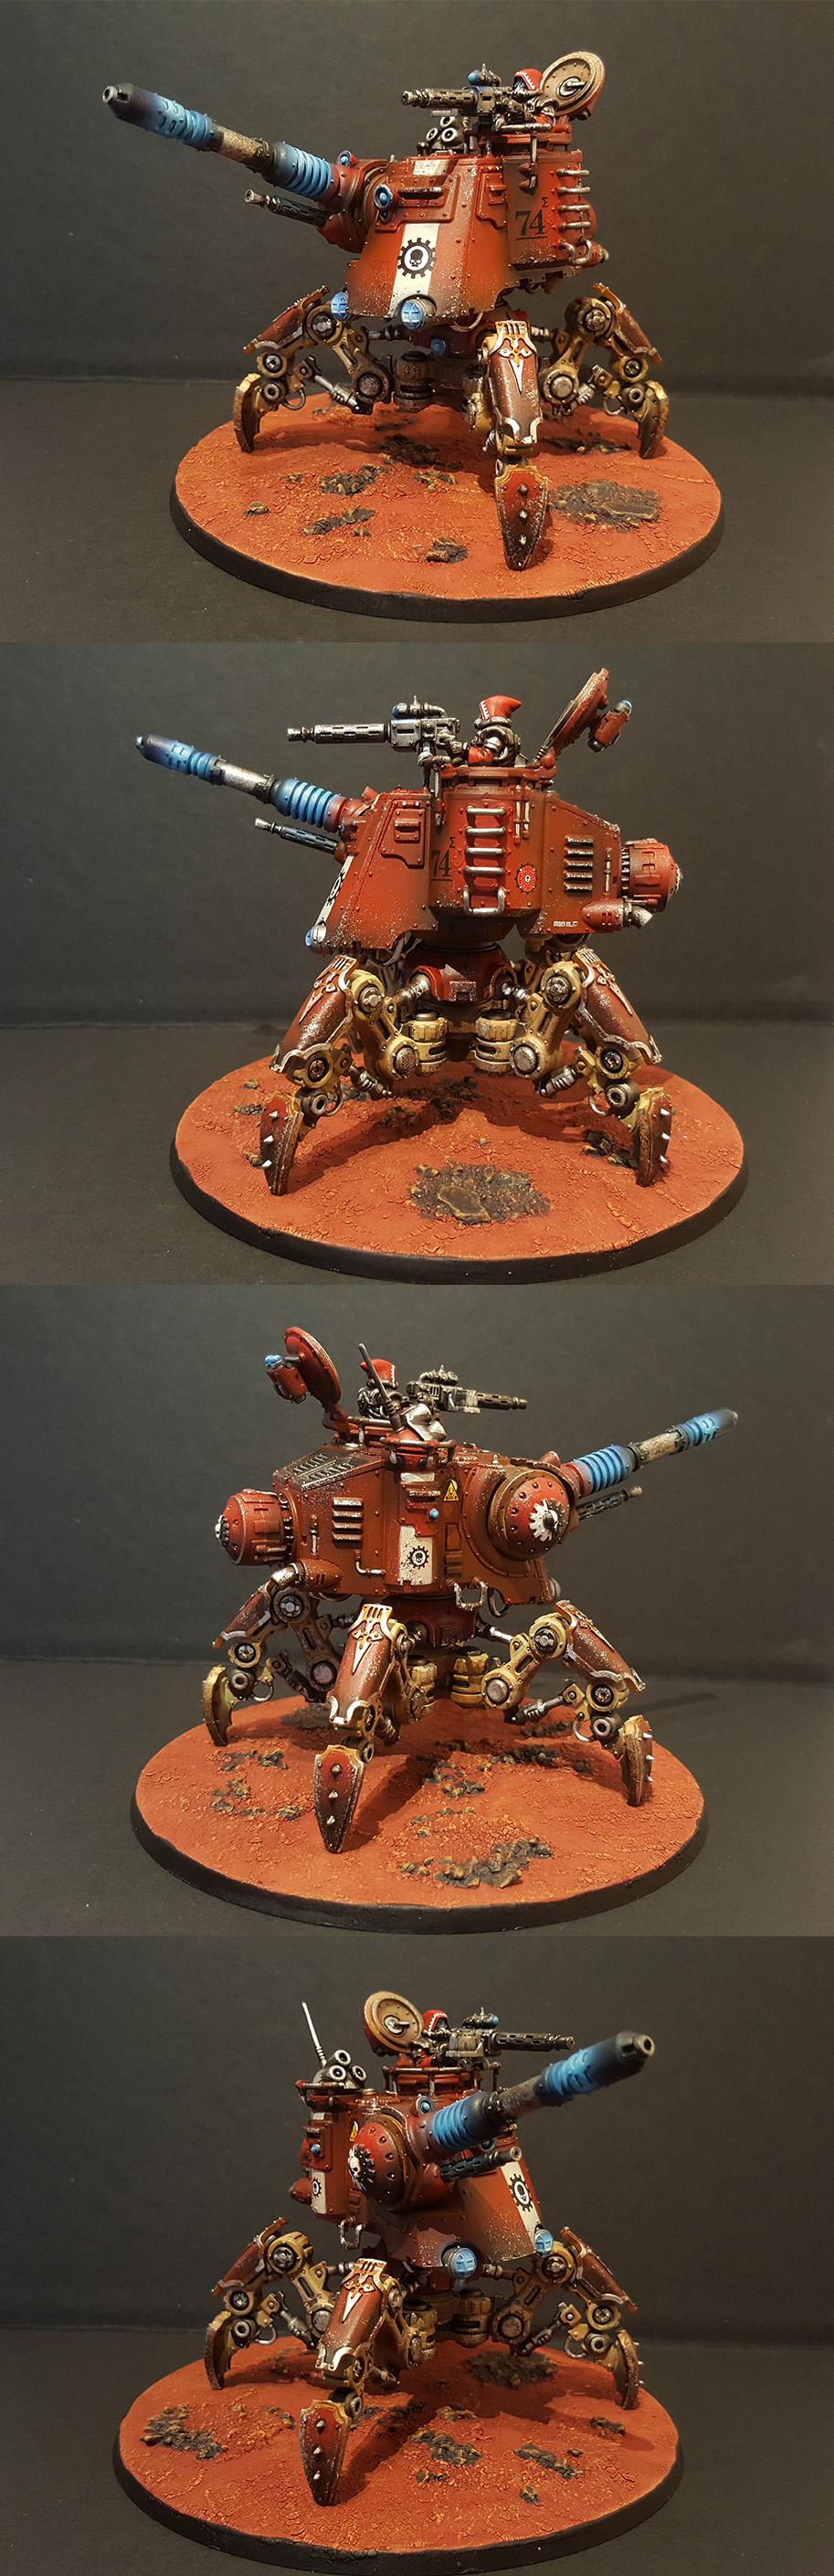 Adeptus Mechanicus Onager Dunecrawler by Amaranth 02